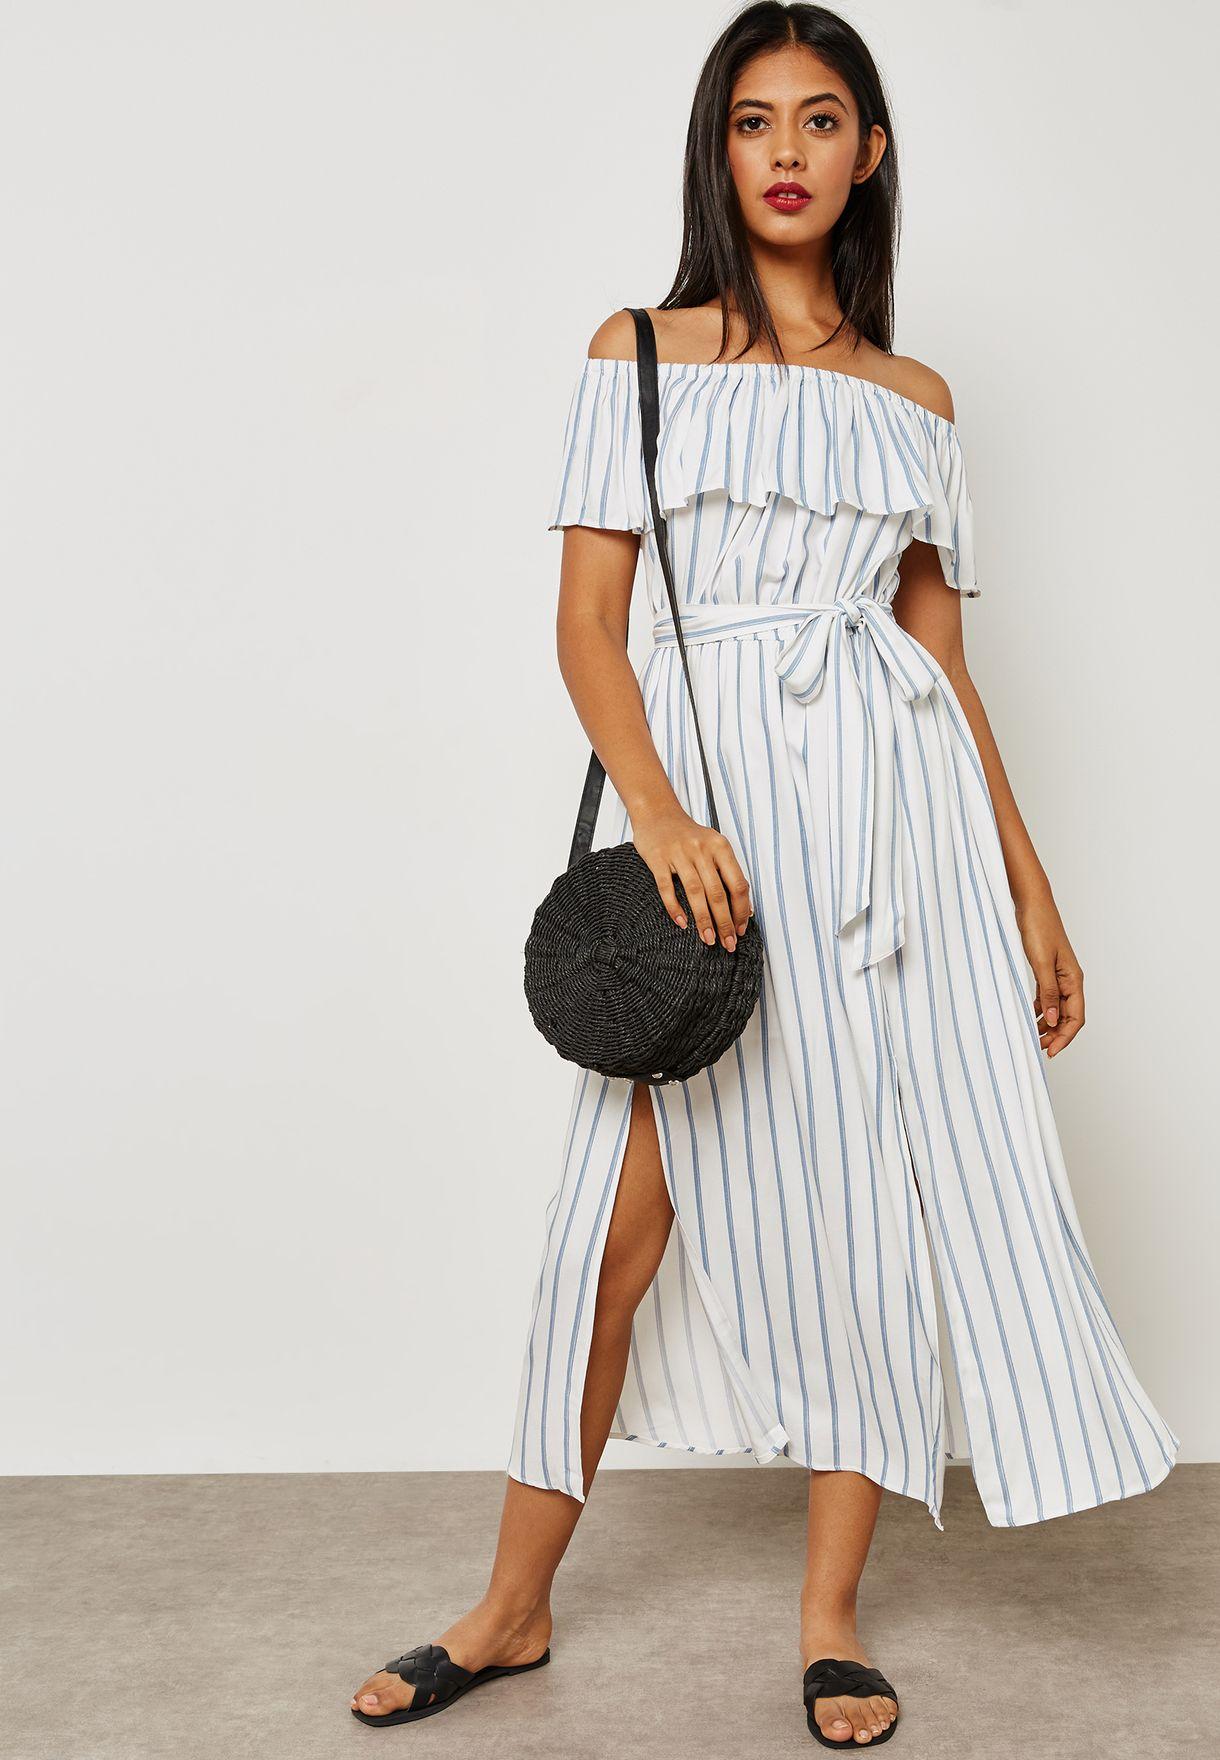 e889bd8037 Shop Forever 21 prints Striped Bardot Maxi Dress 289727 for Women in ...